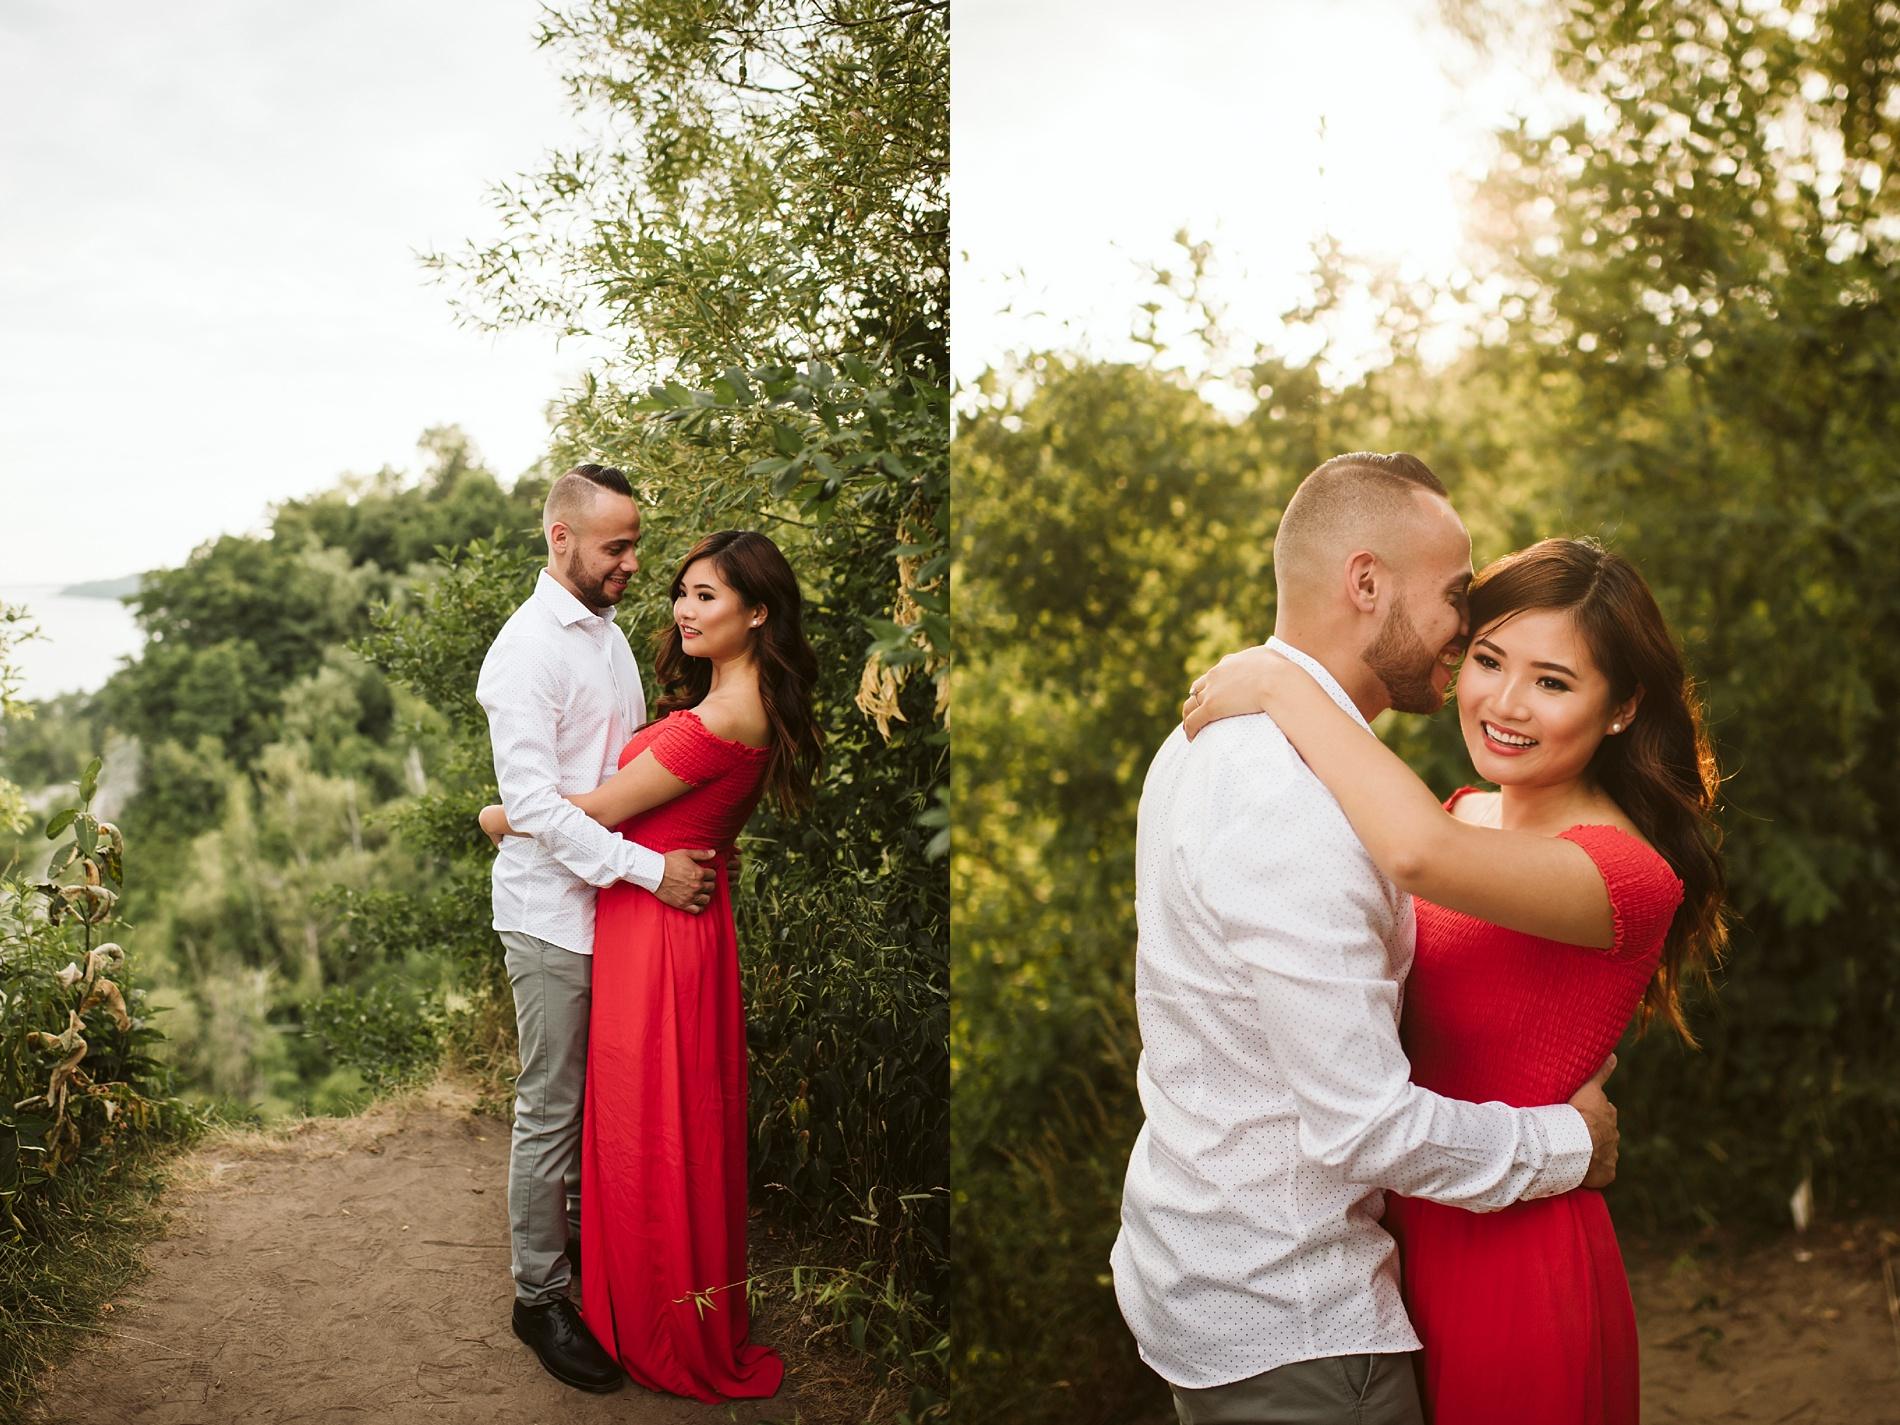 Scarborough_Bluffs_engagement_shoot_Best_Toronto_Wedding_Photographers_0002.jpg